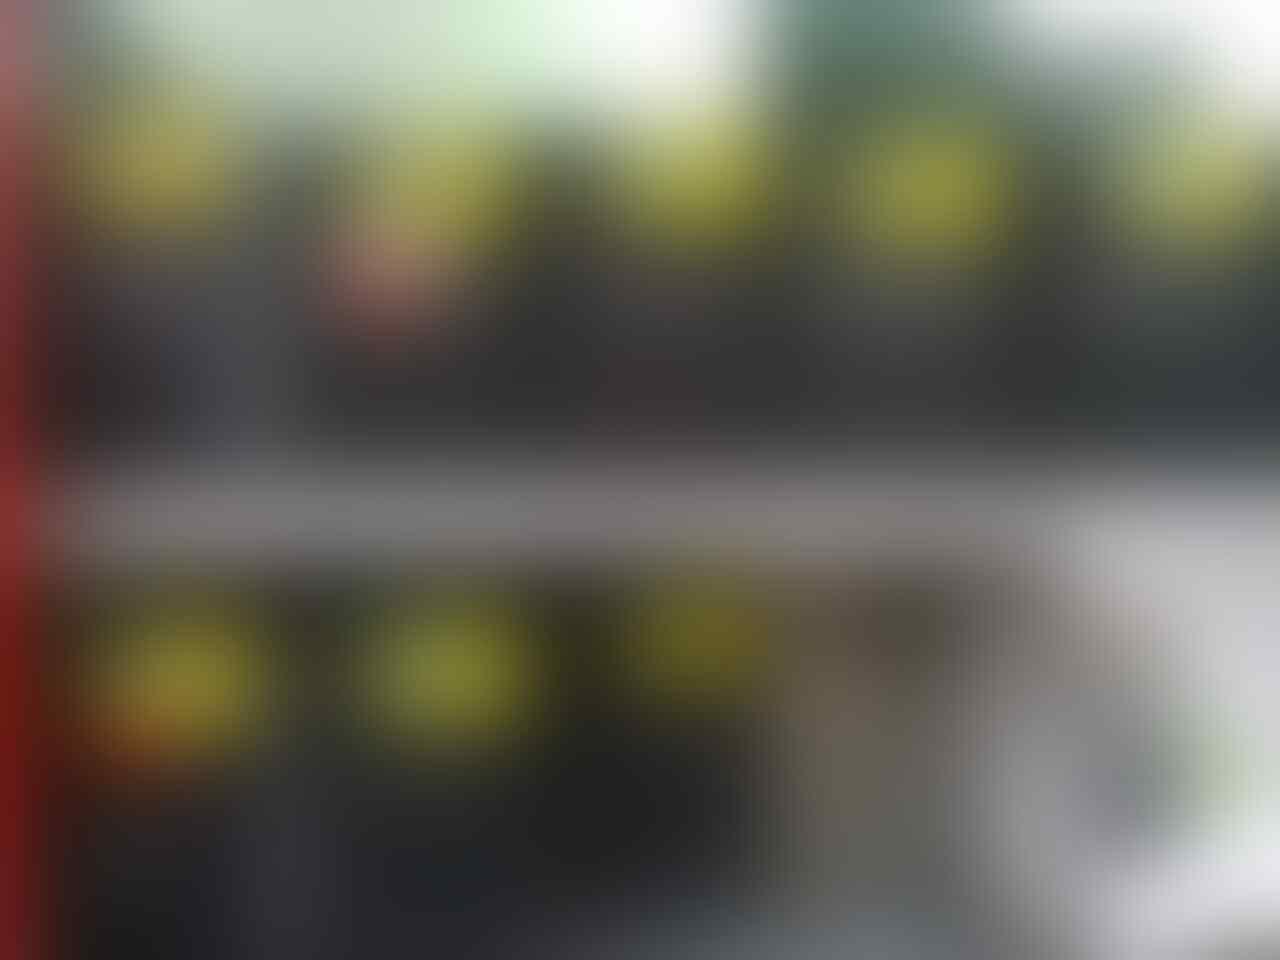 NEW BNIB IPHONE 4 CDMA 16GB, BLACKBERRY ARIES, JUPITER SEMARANG